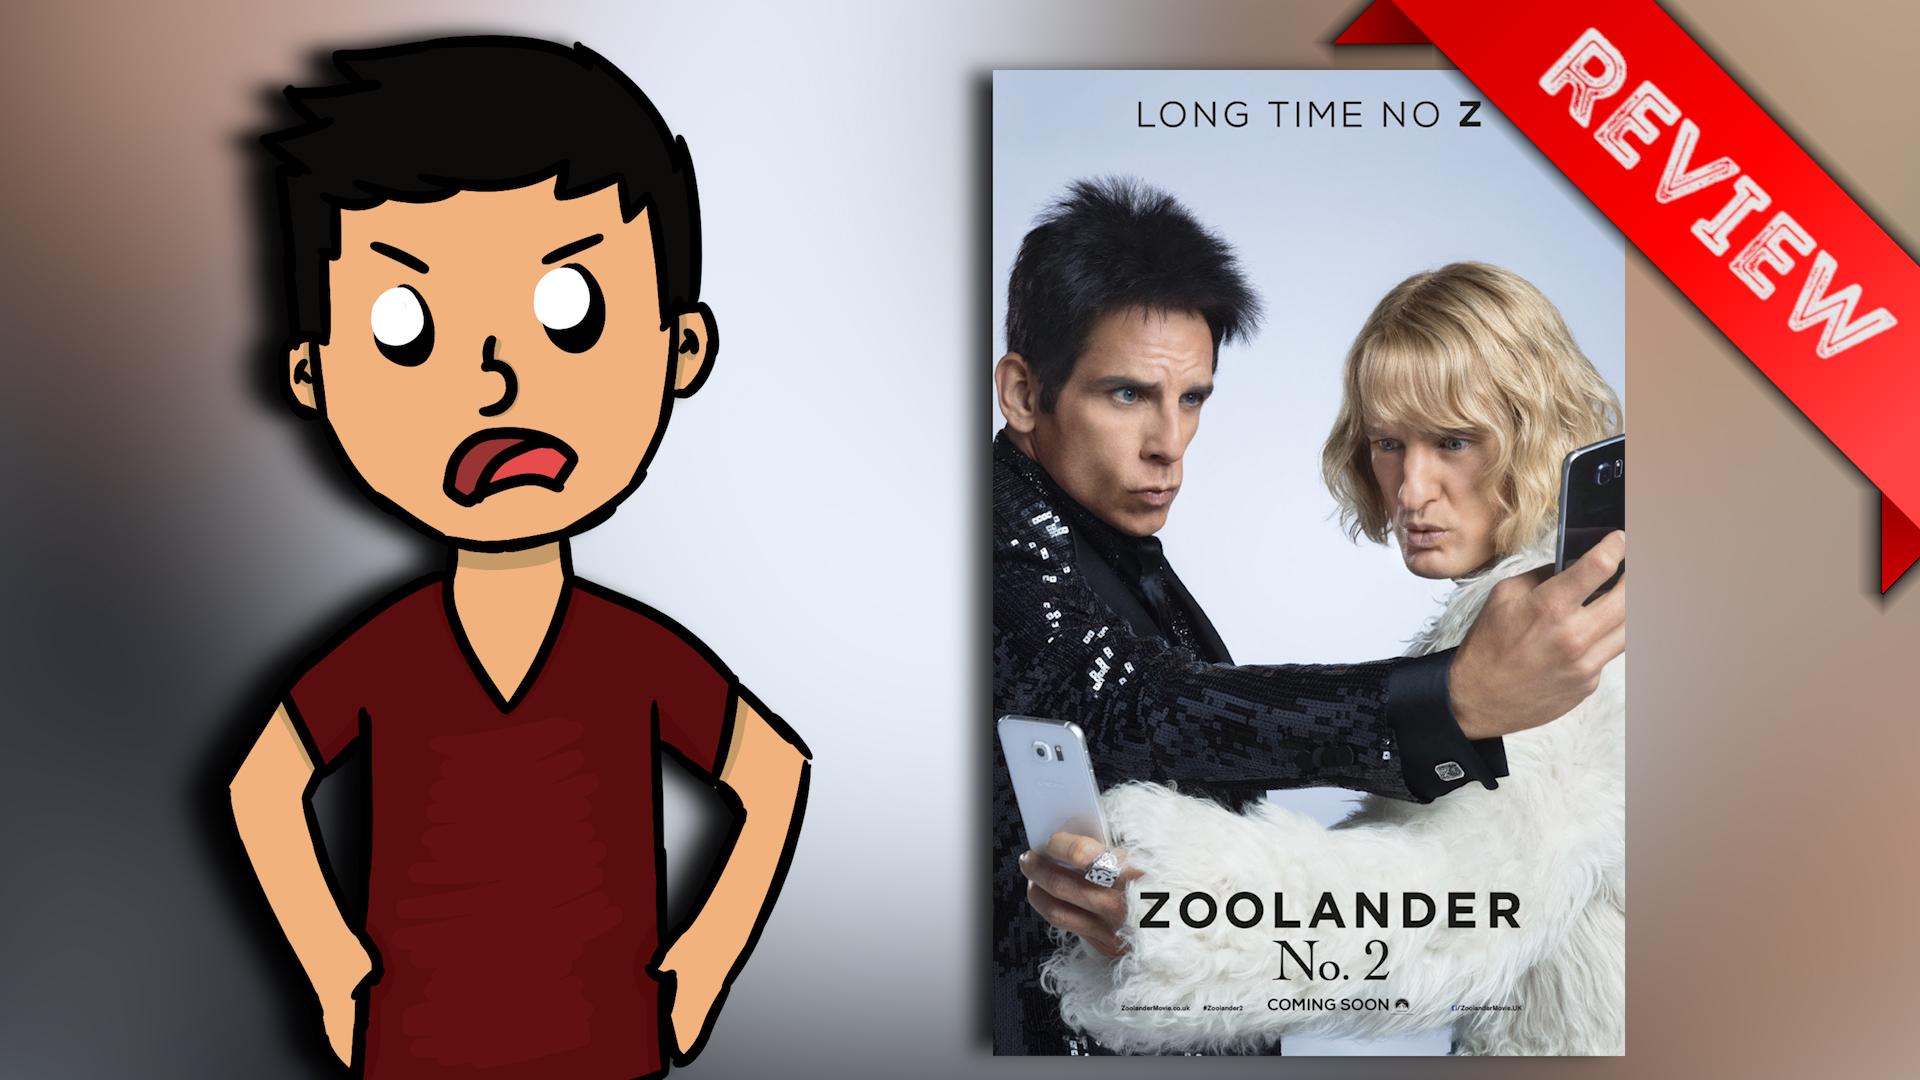 DIRECTOR: Ben Stiller | STARRING: Ben Stiller, Owen Wilson, Penelope Cruz  RUNTIME: 102 minutes | RATING: PG-13 | SCORE: 1/5